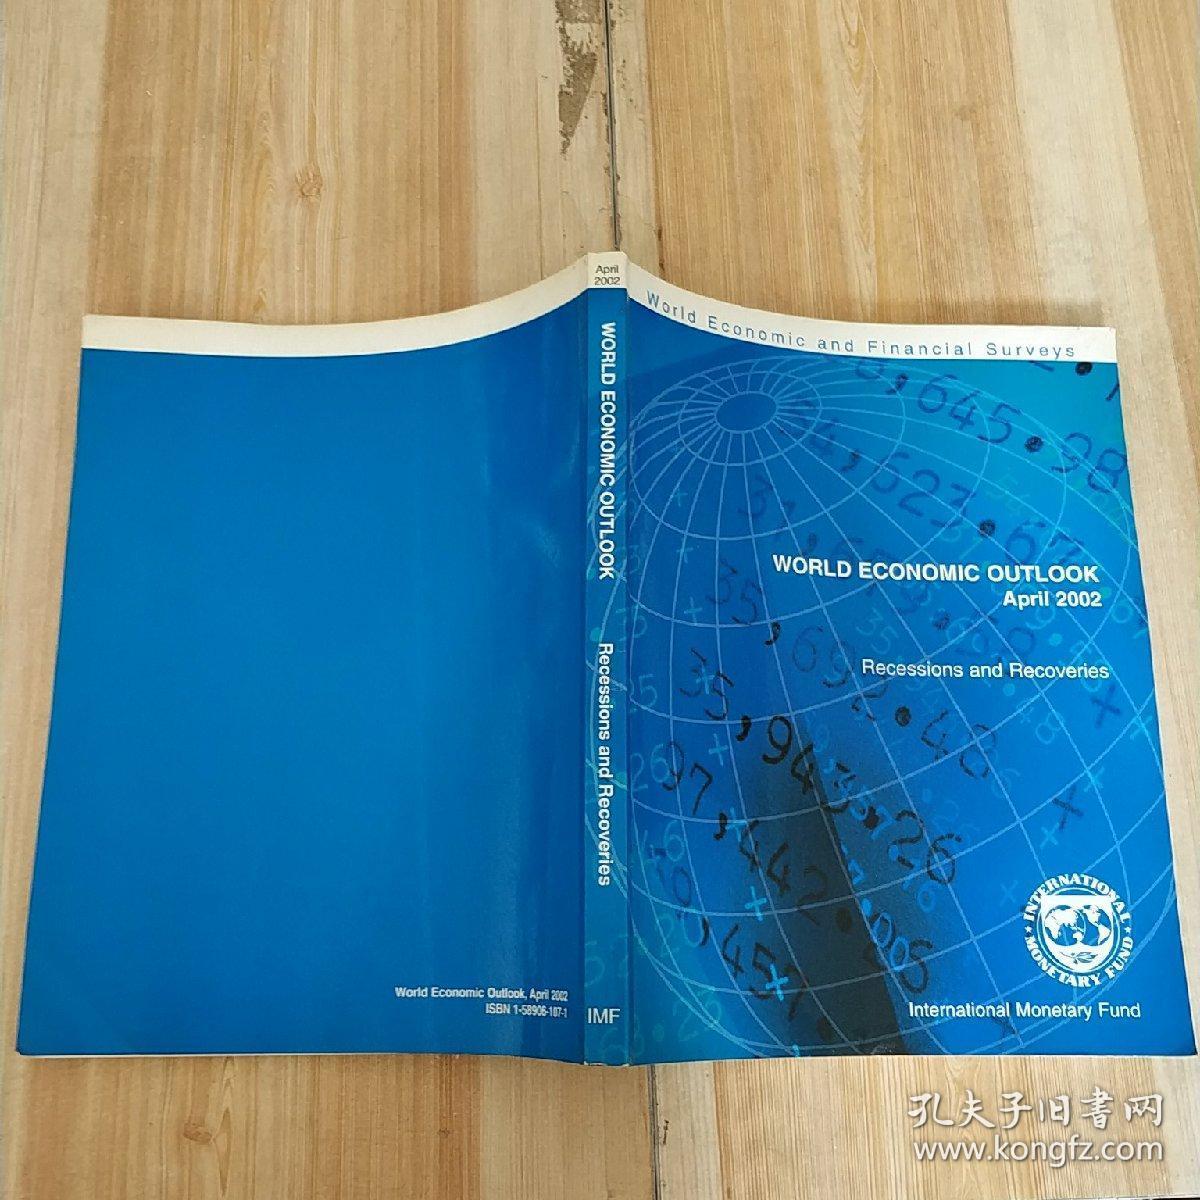 WORLD ECONOMIC OUTLOOK April2002【世界经济展望(前景)】